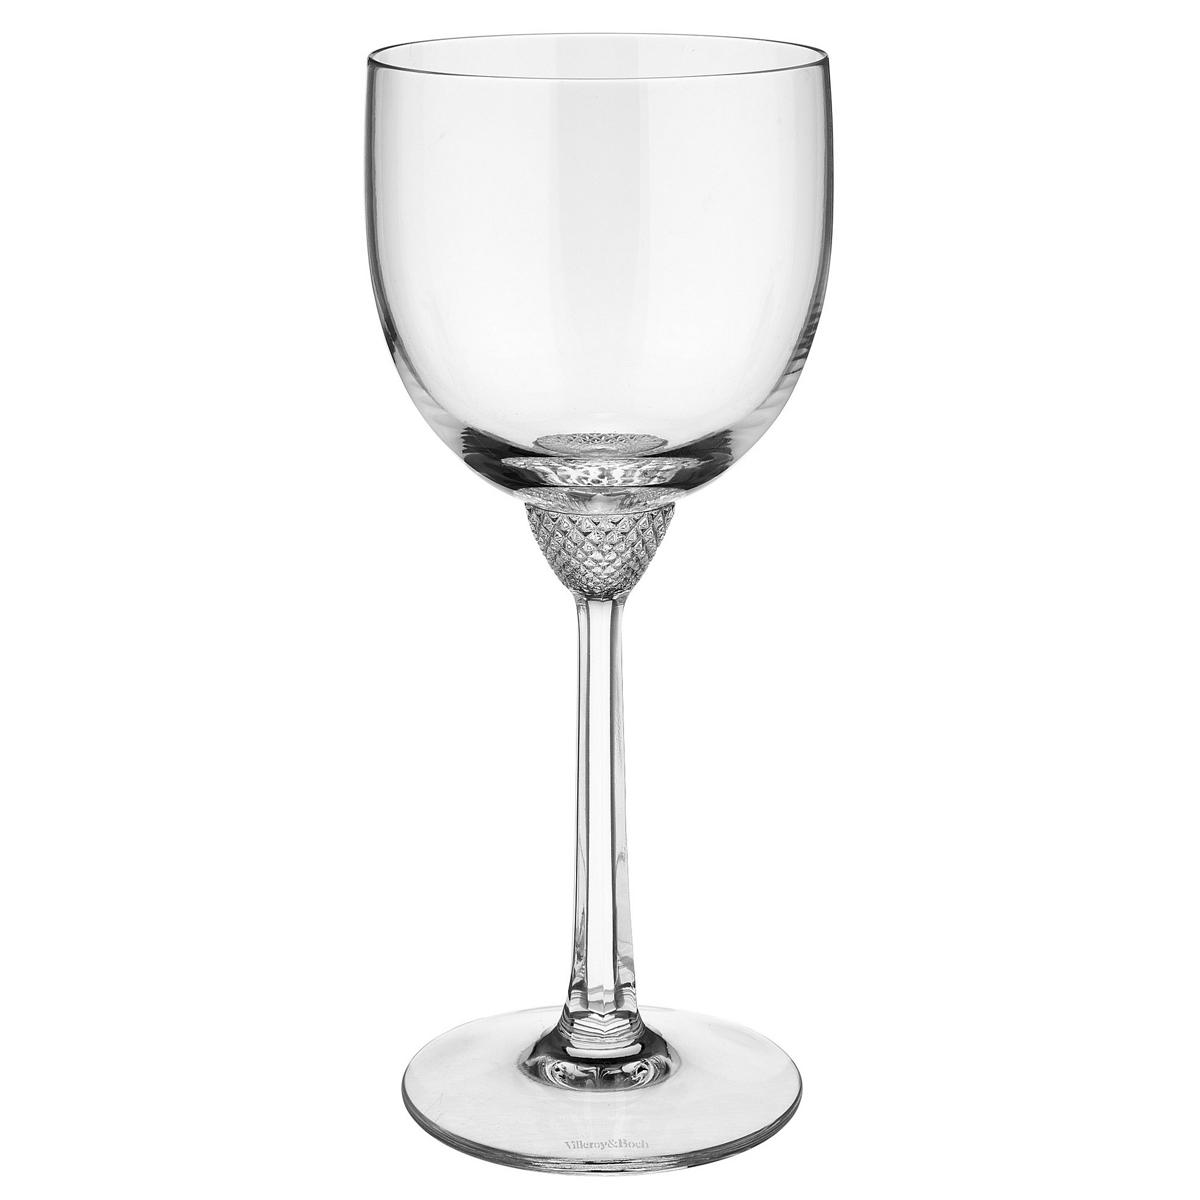 Villeroy and Boch Octavie Red Wine, Single